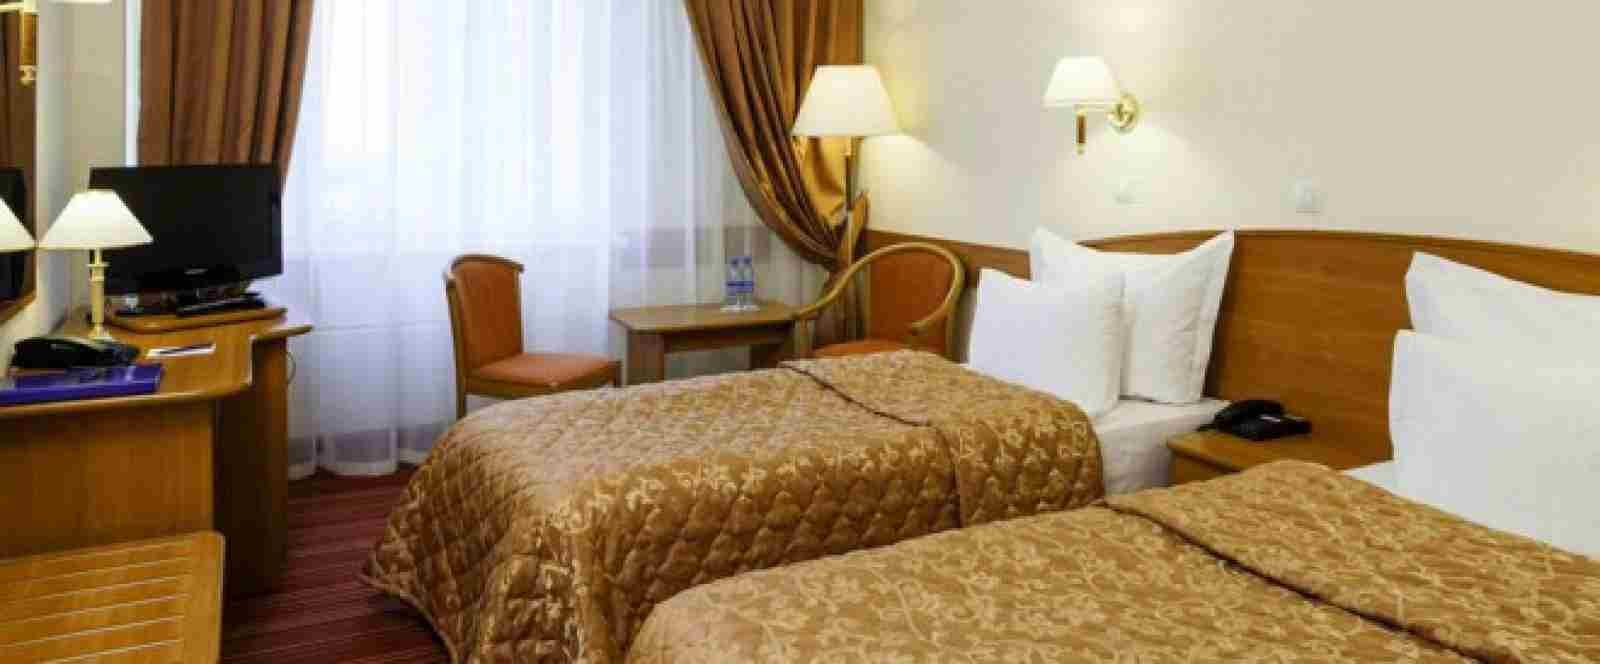 3-комнатная квартира по суткам в Речице от 45 тыс. за 1 чел. в сутки